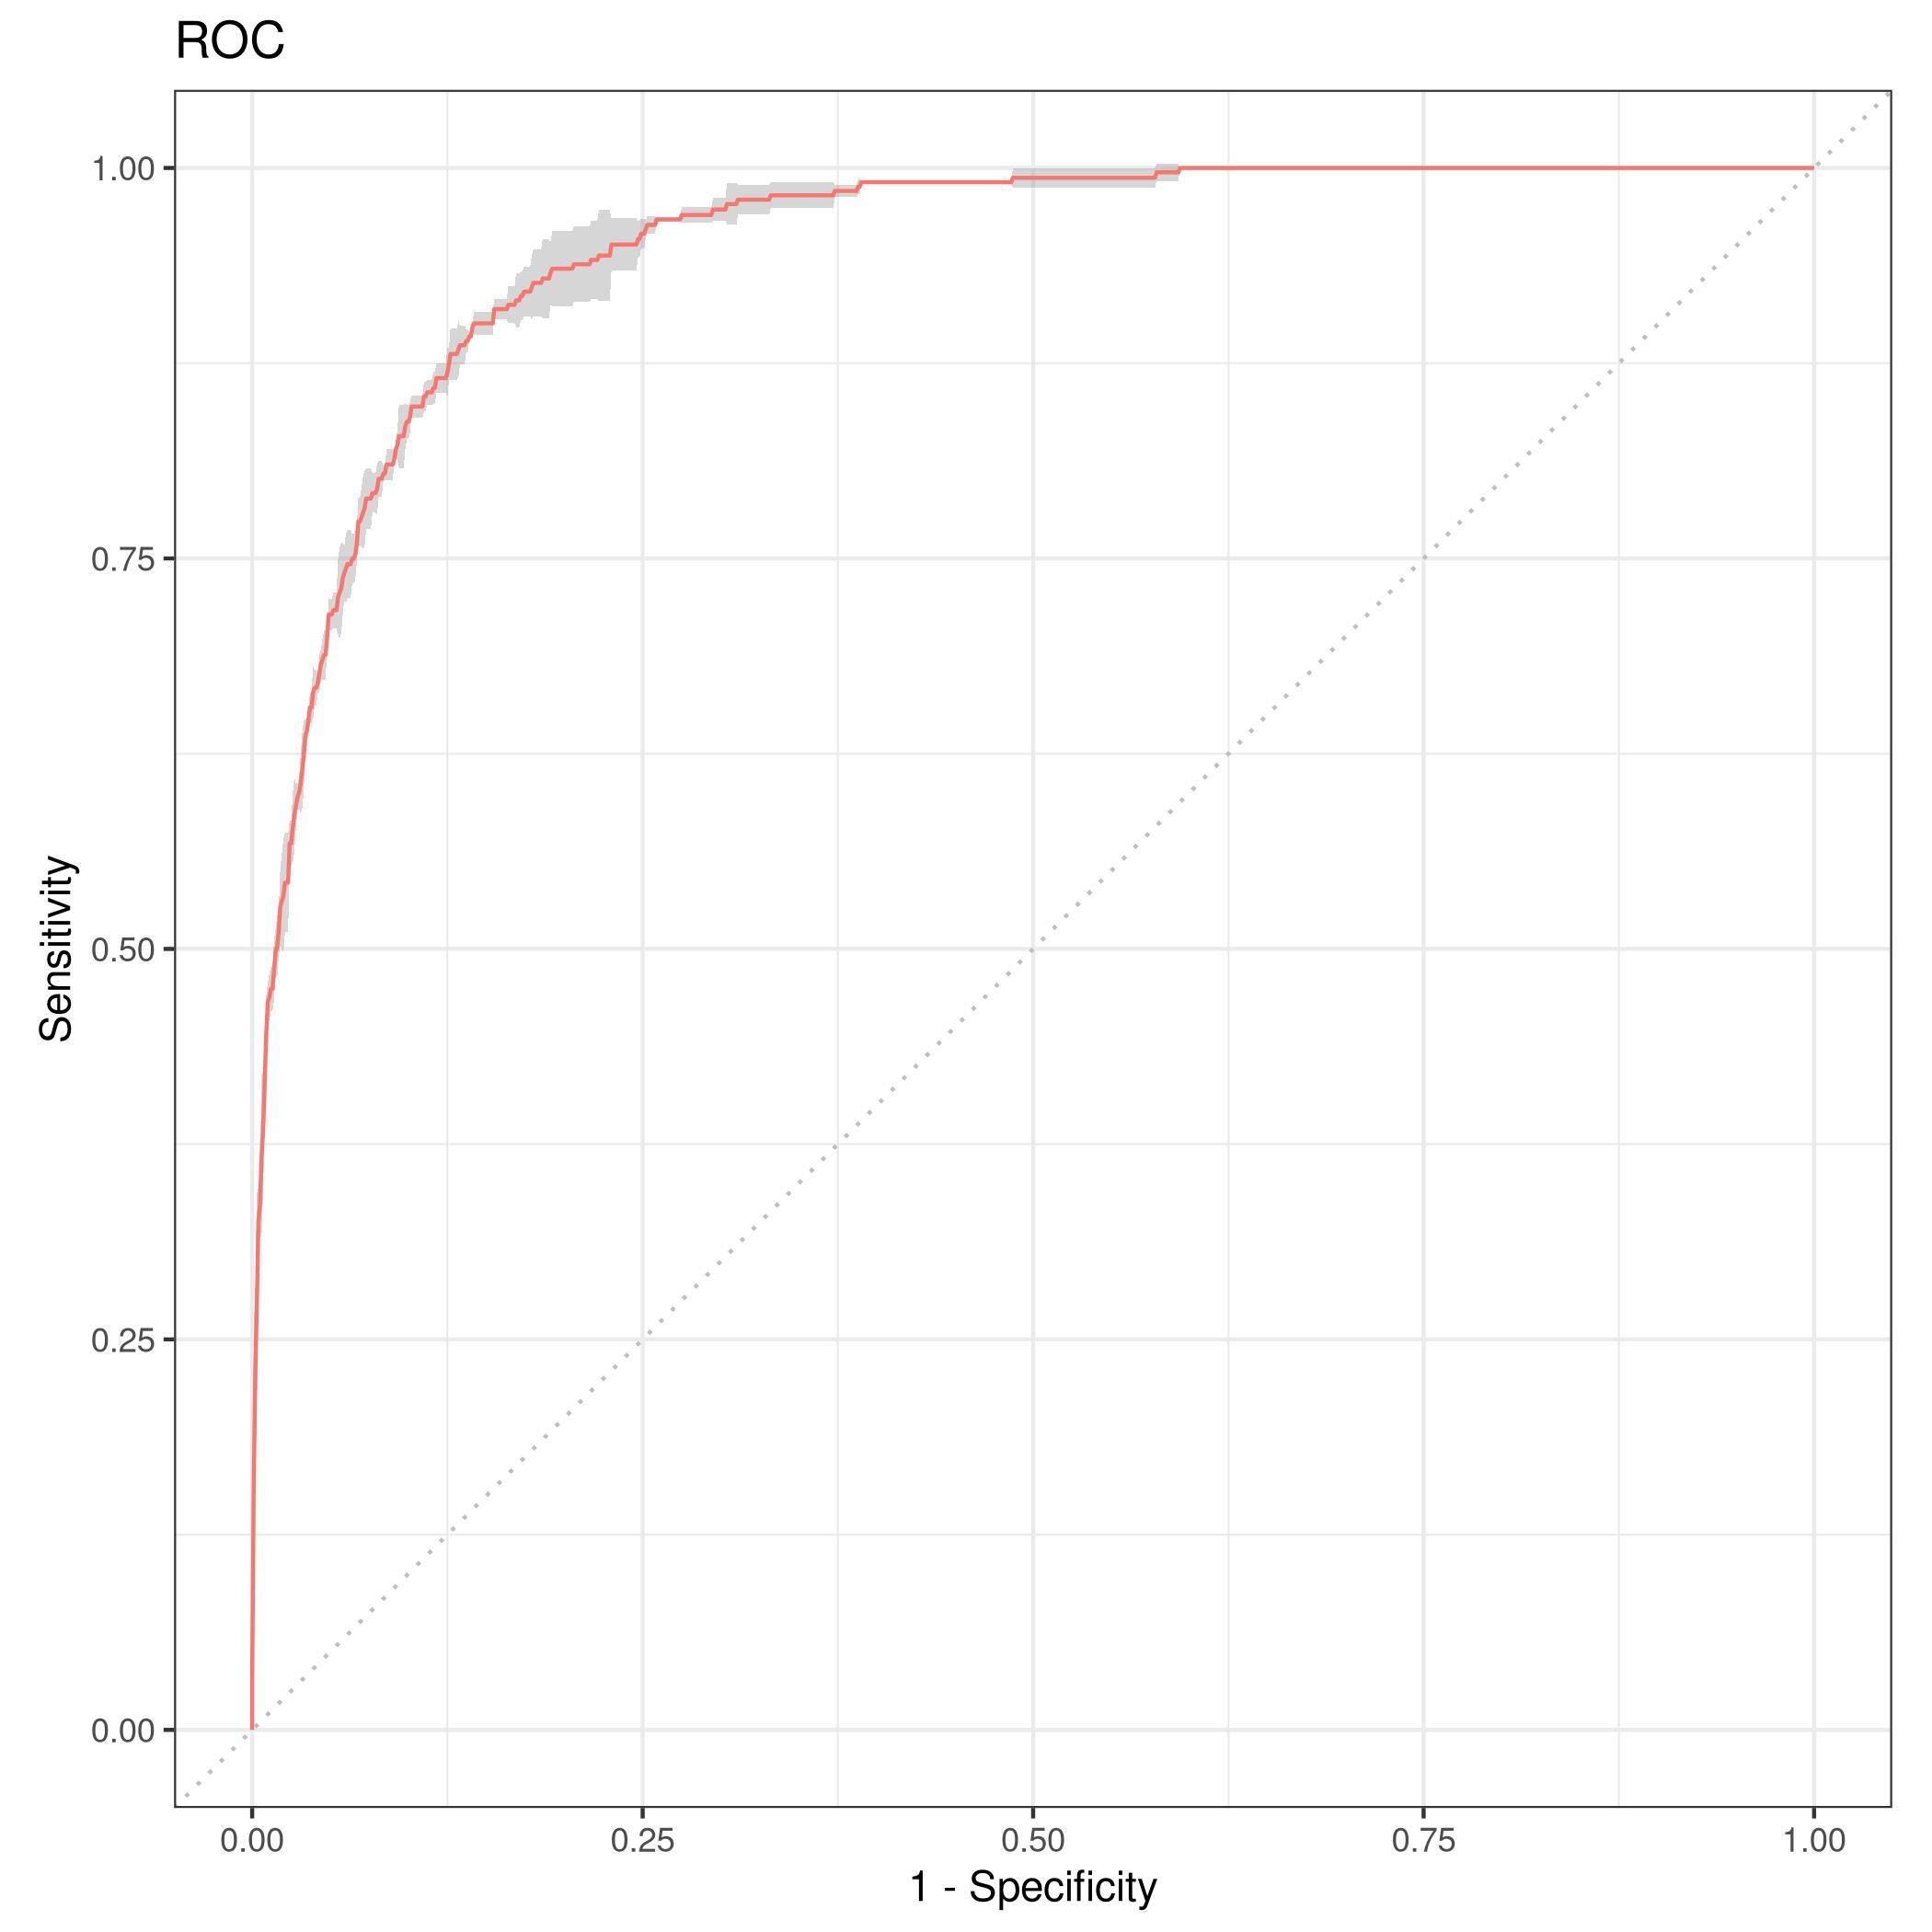 Figure 5: Resampled ROC curve